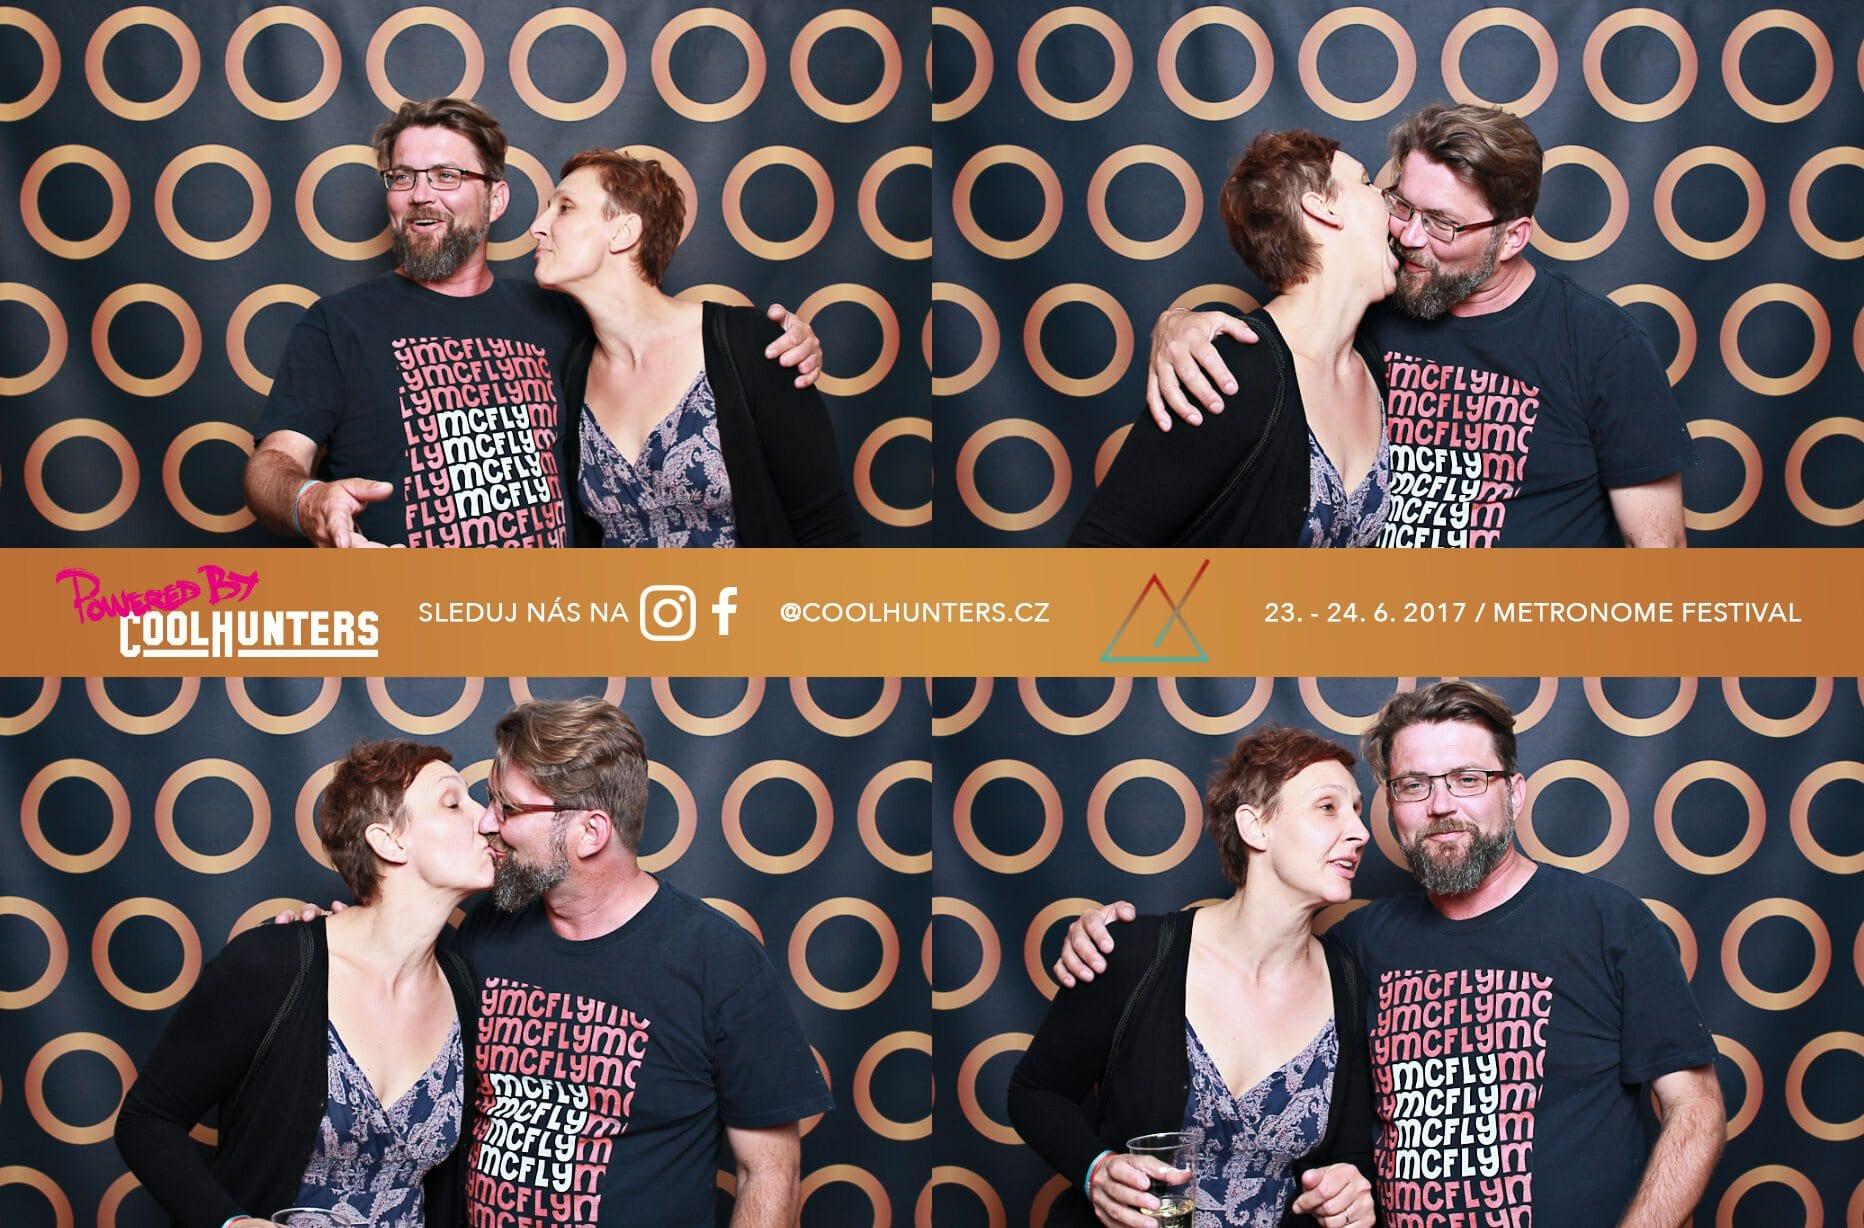 fotokoutek-coolhunters-metronome-festival-24-6-2017-273573